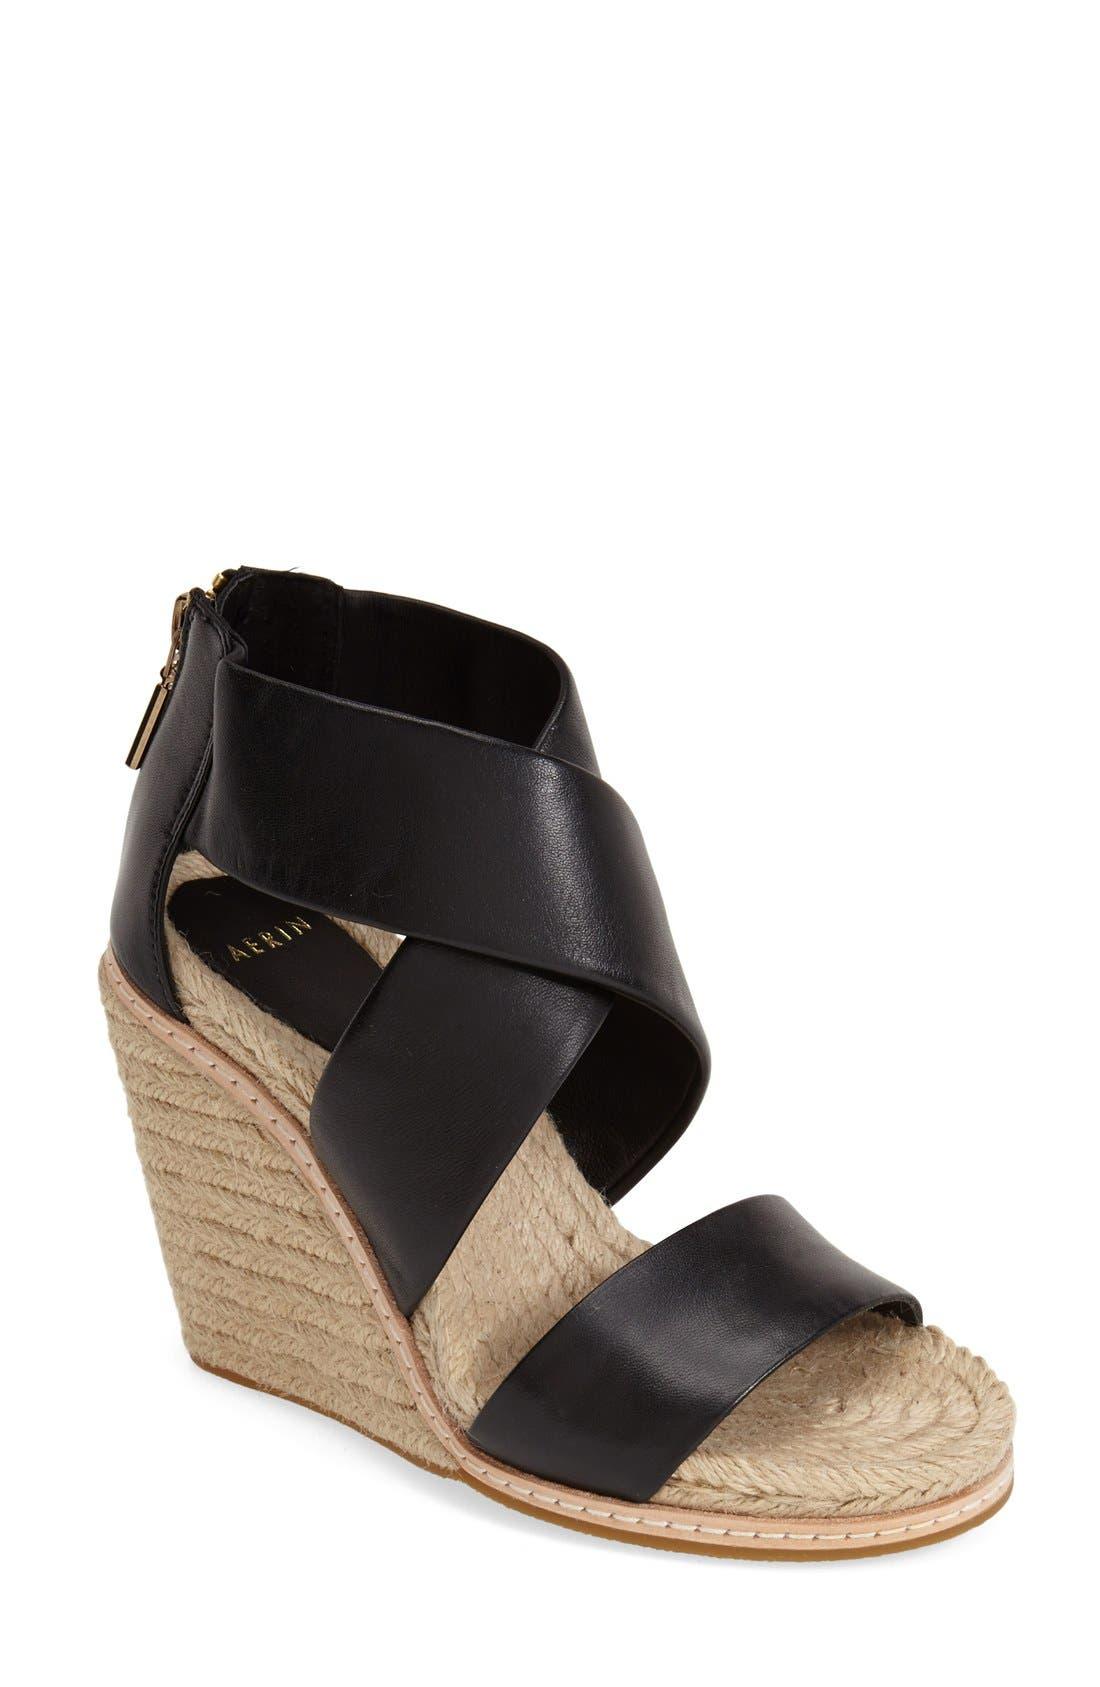 Alternate Image 1 Selected - Aerin 'Jayden' Espadrille Wedge Sandal (Women)